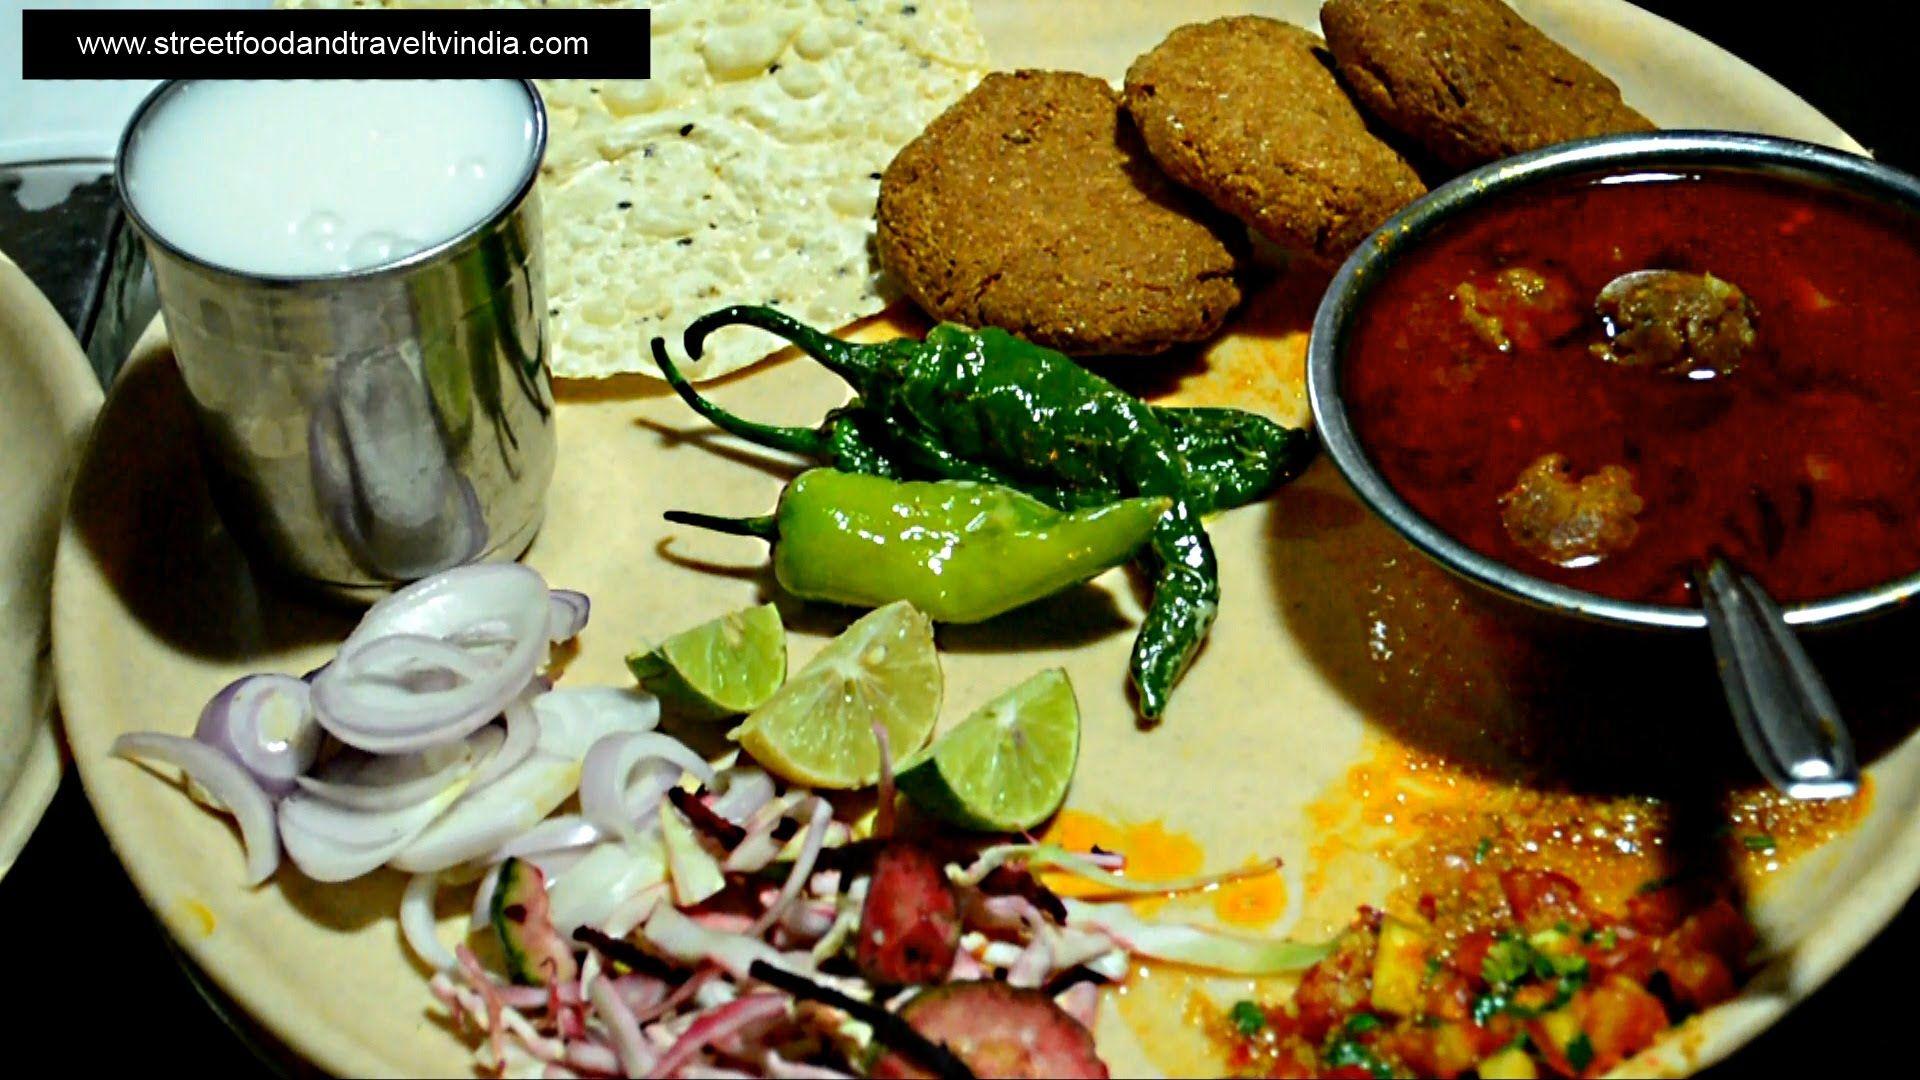 Great undhiyu chapadi youtube exclusive indian food by street food great undhiyu chapadi youtube exclusive indian food by street food travel tv india forumfinder Choice Image